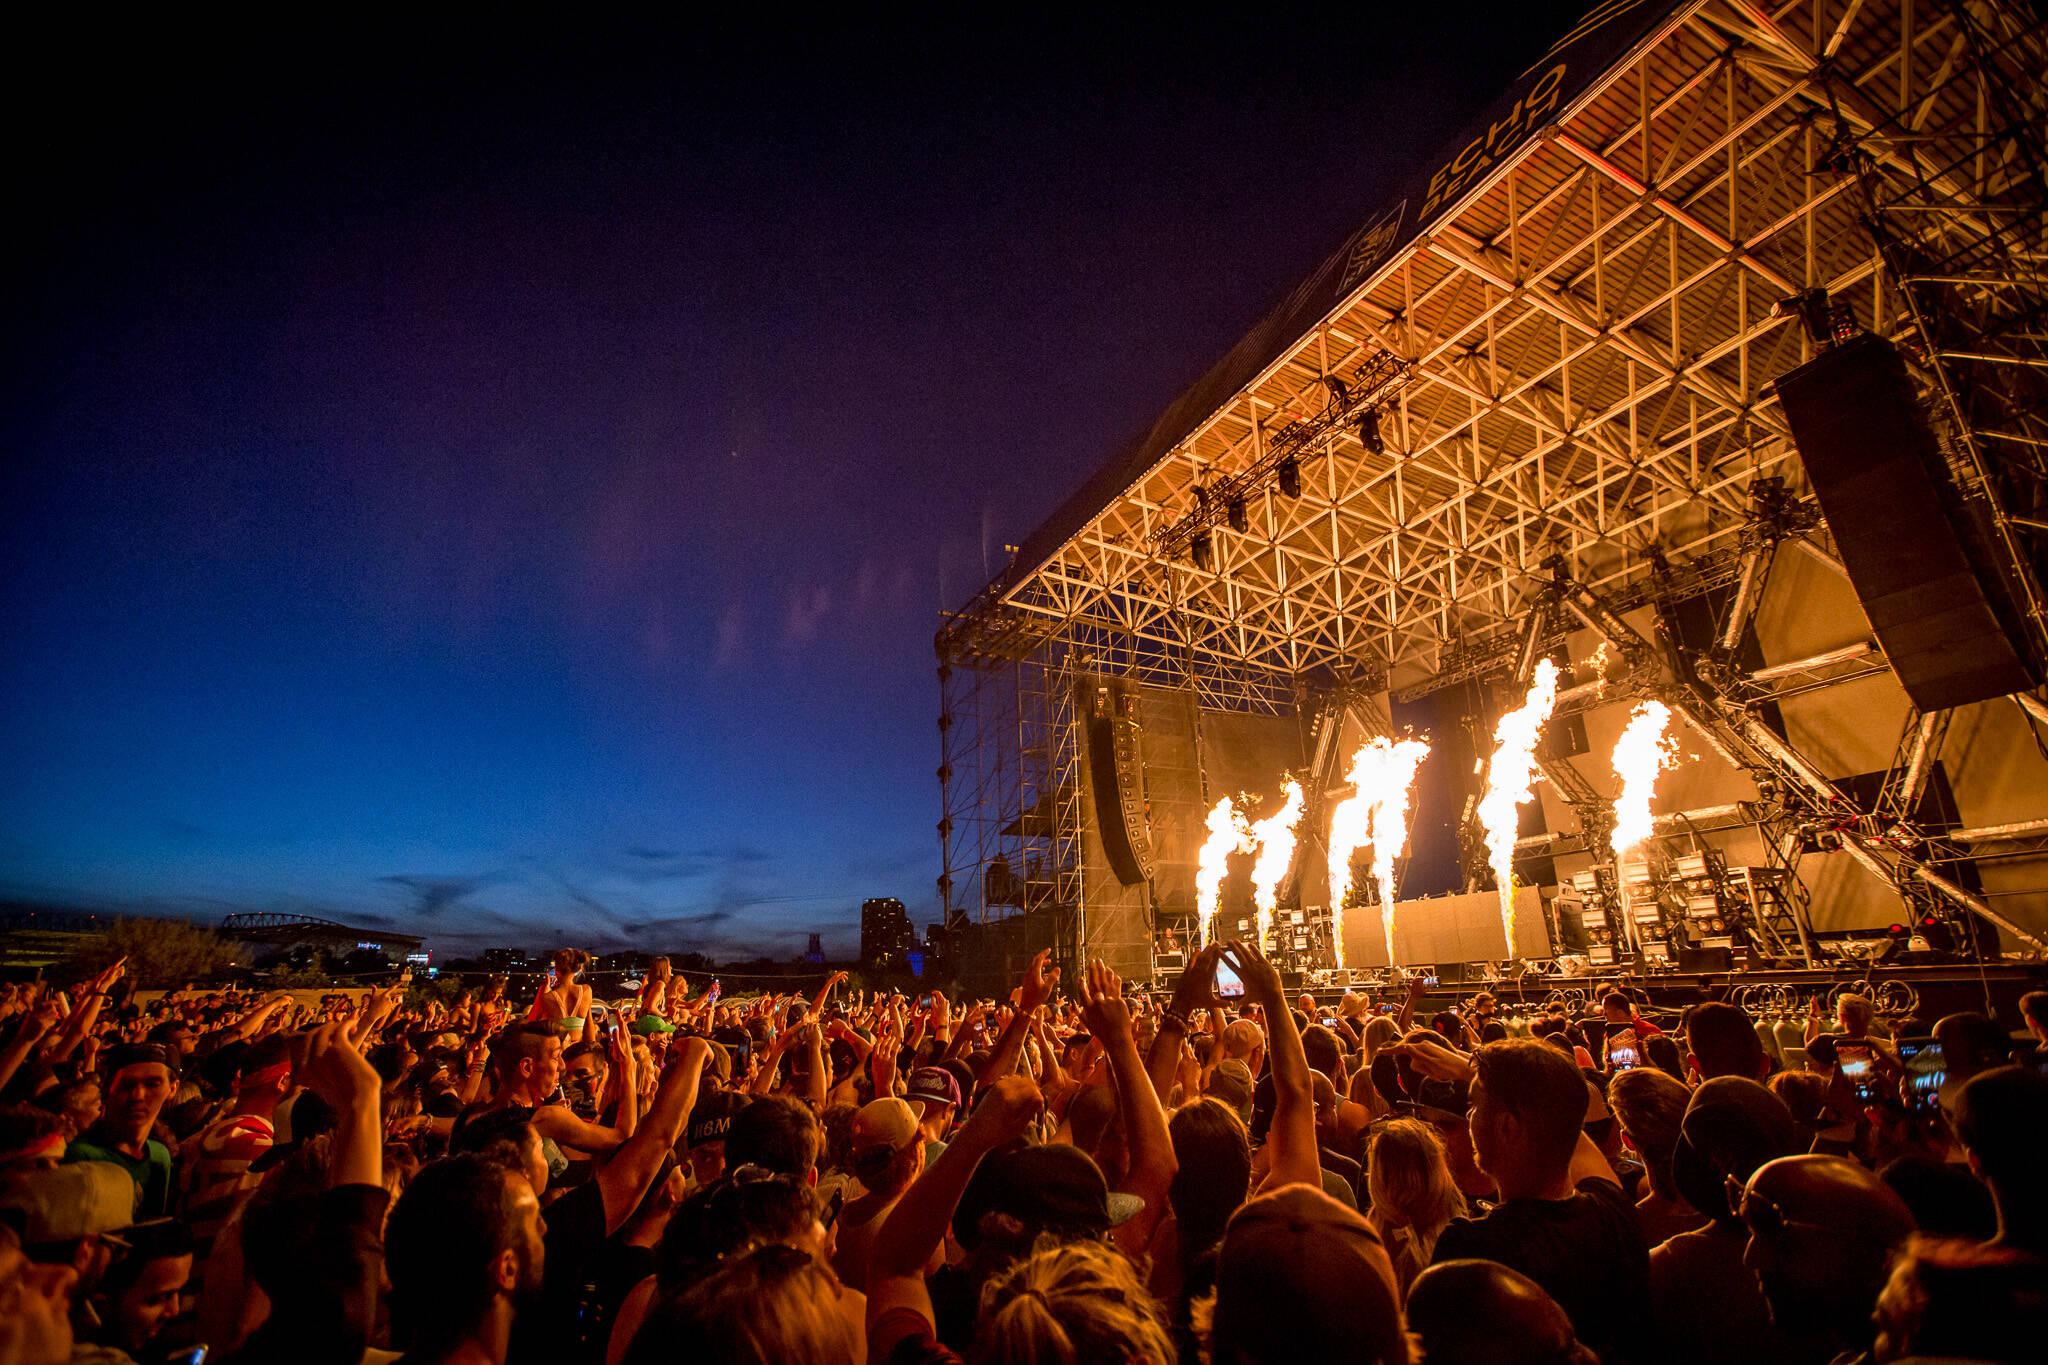 toronto concerts may 2018